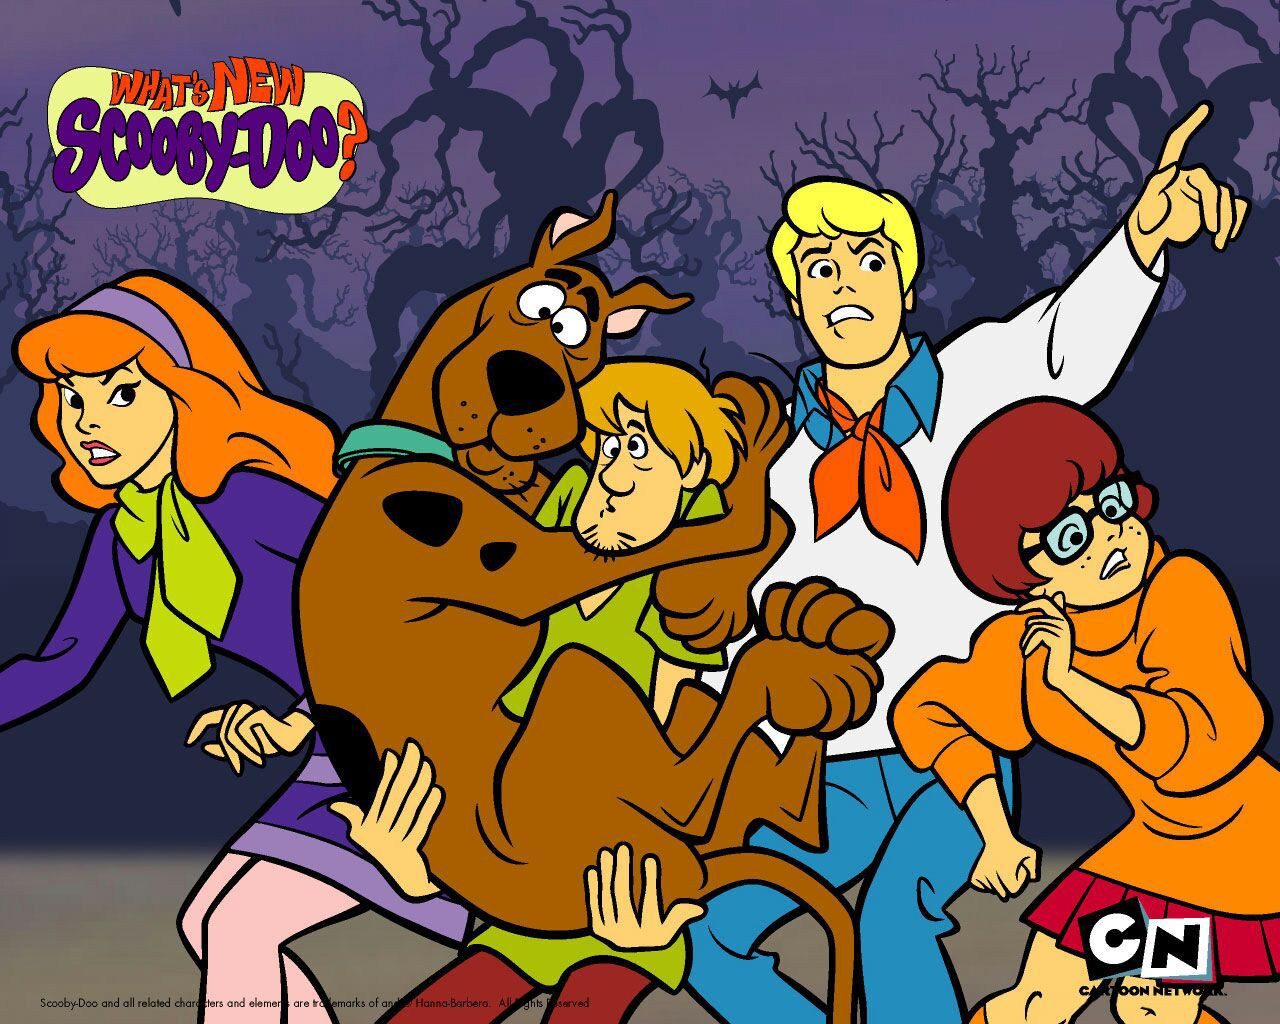 Teoria Dos Desenhos Scooby Doo Wattpad